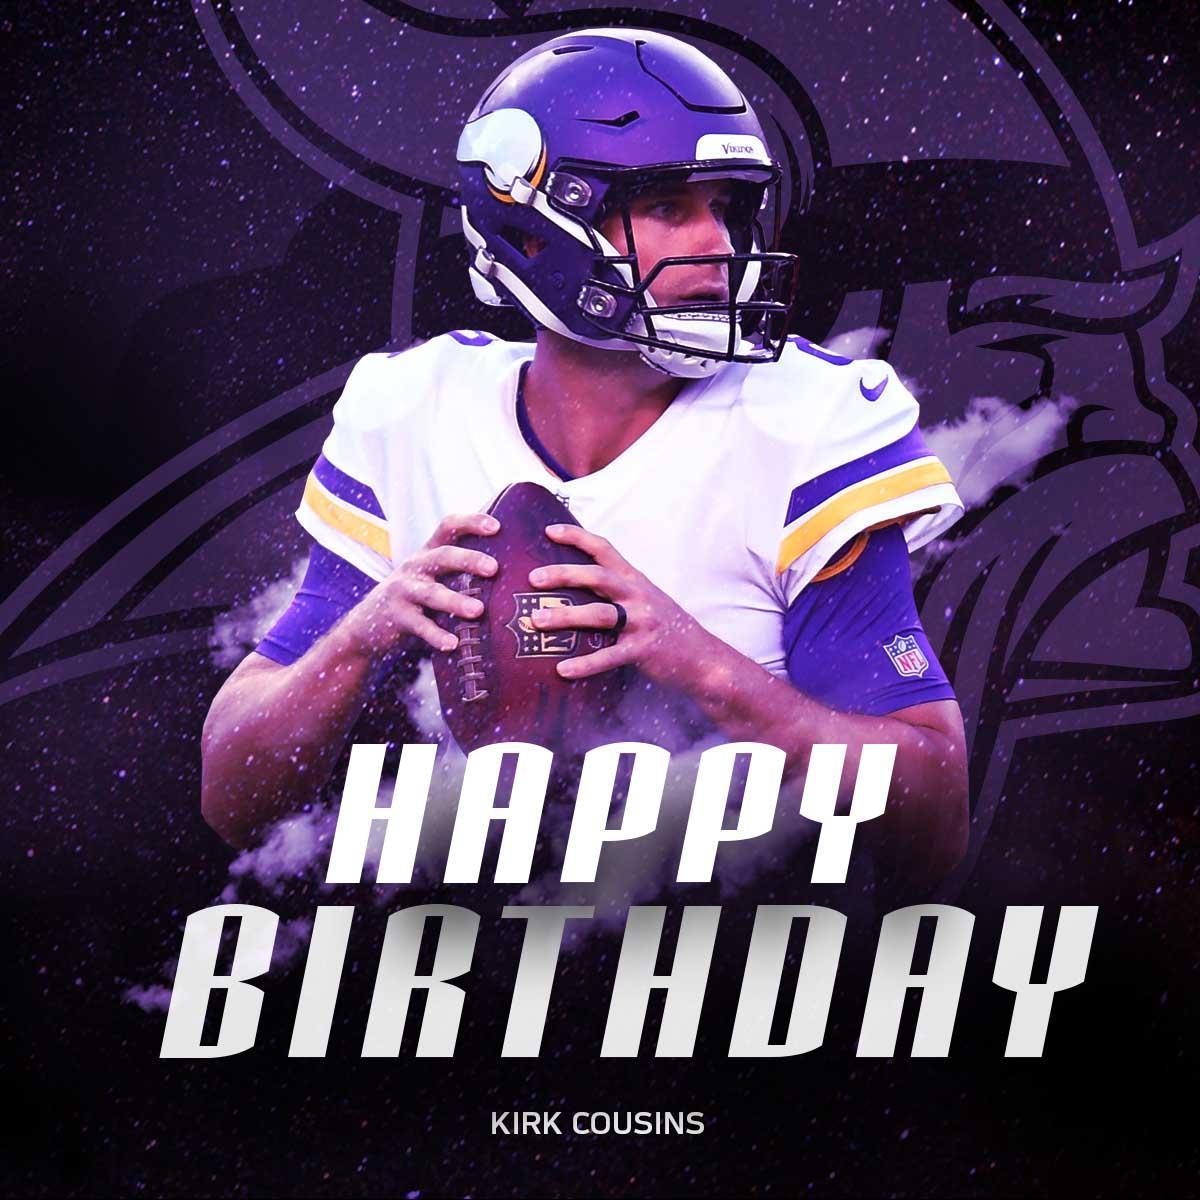 HAPPY 3️⃣0️⃣TH BIRTHDAY to @Vikings QB @KirkCousins8! ������ https://t.co/cKoNgFfQhJ